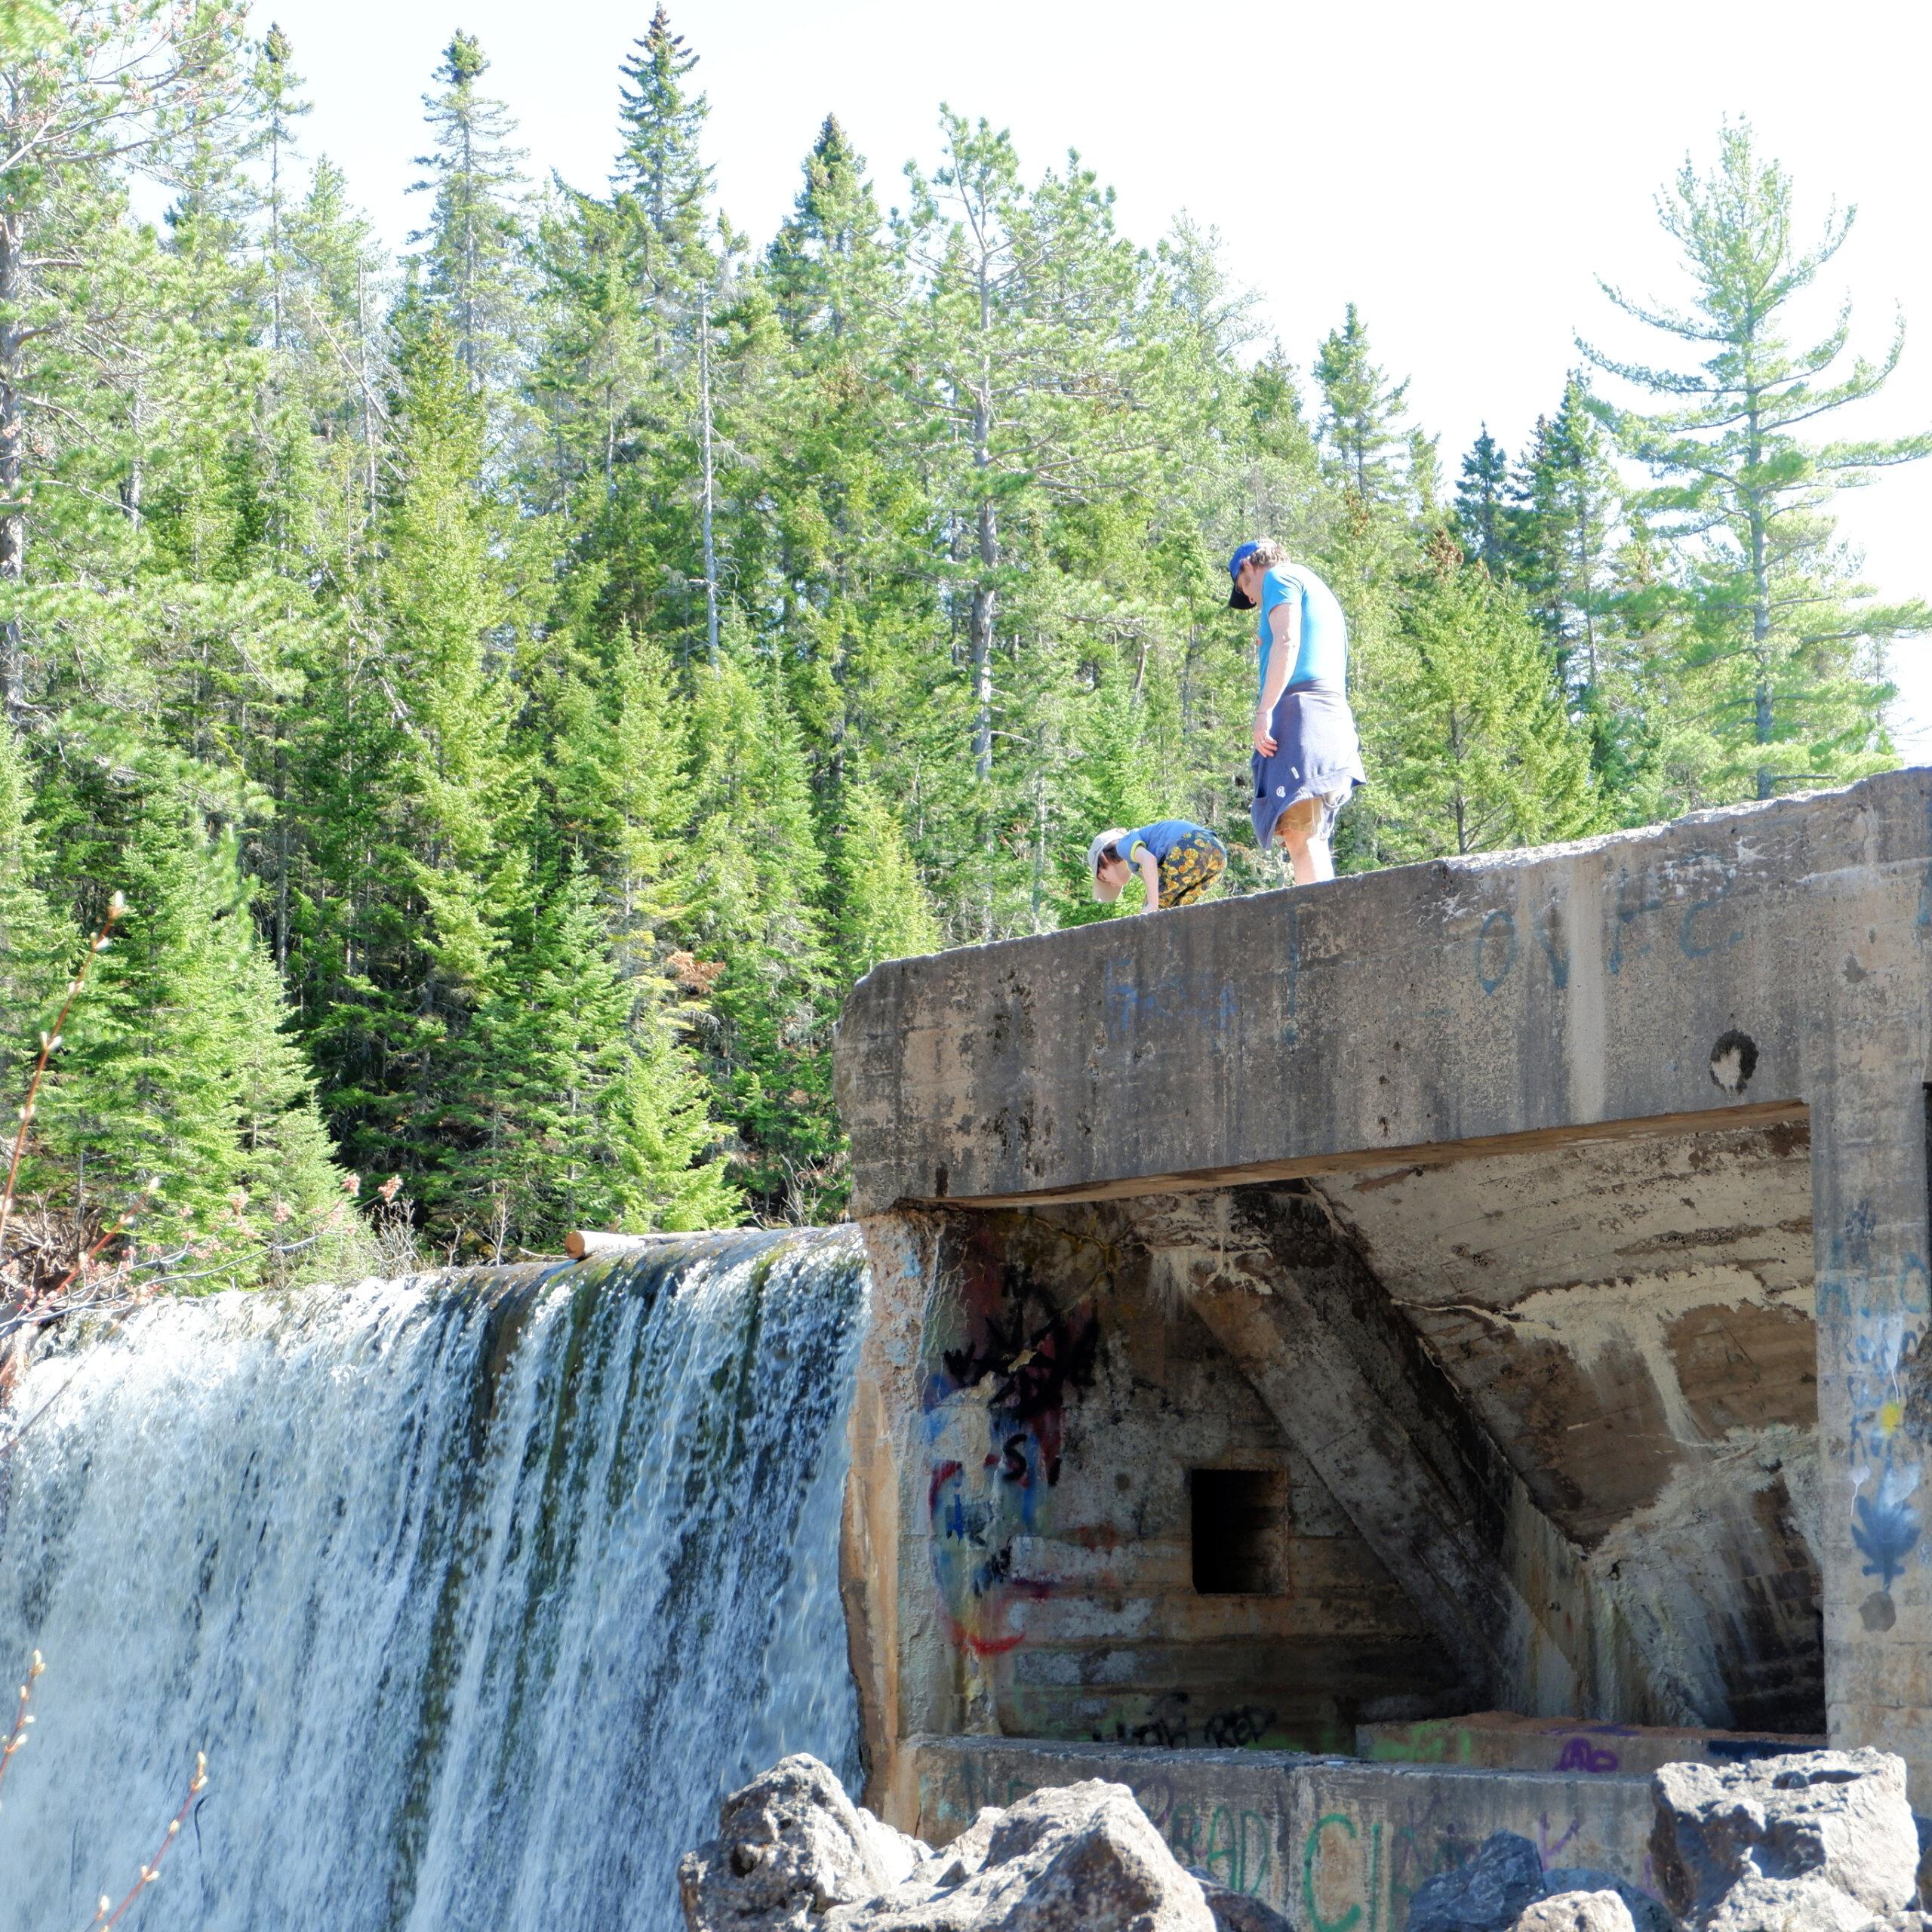 mill creek riverview new brunswick kids family hike walk geocaching sunfest things to do new brunswick pickle planet